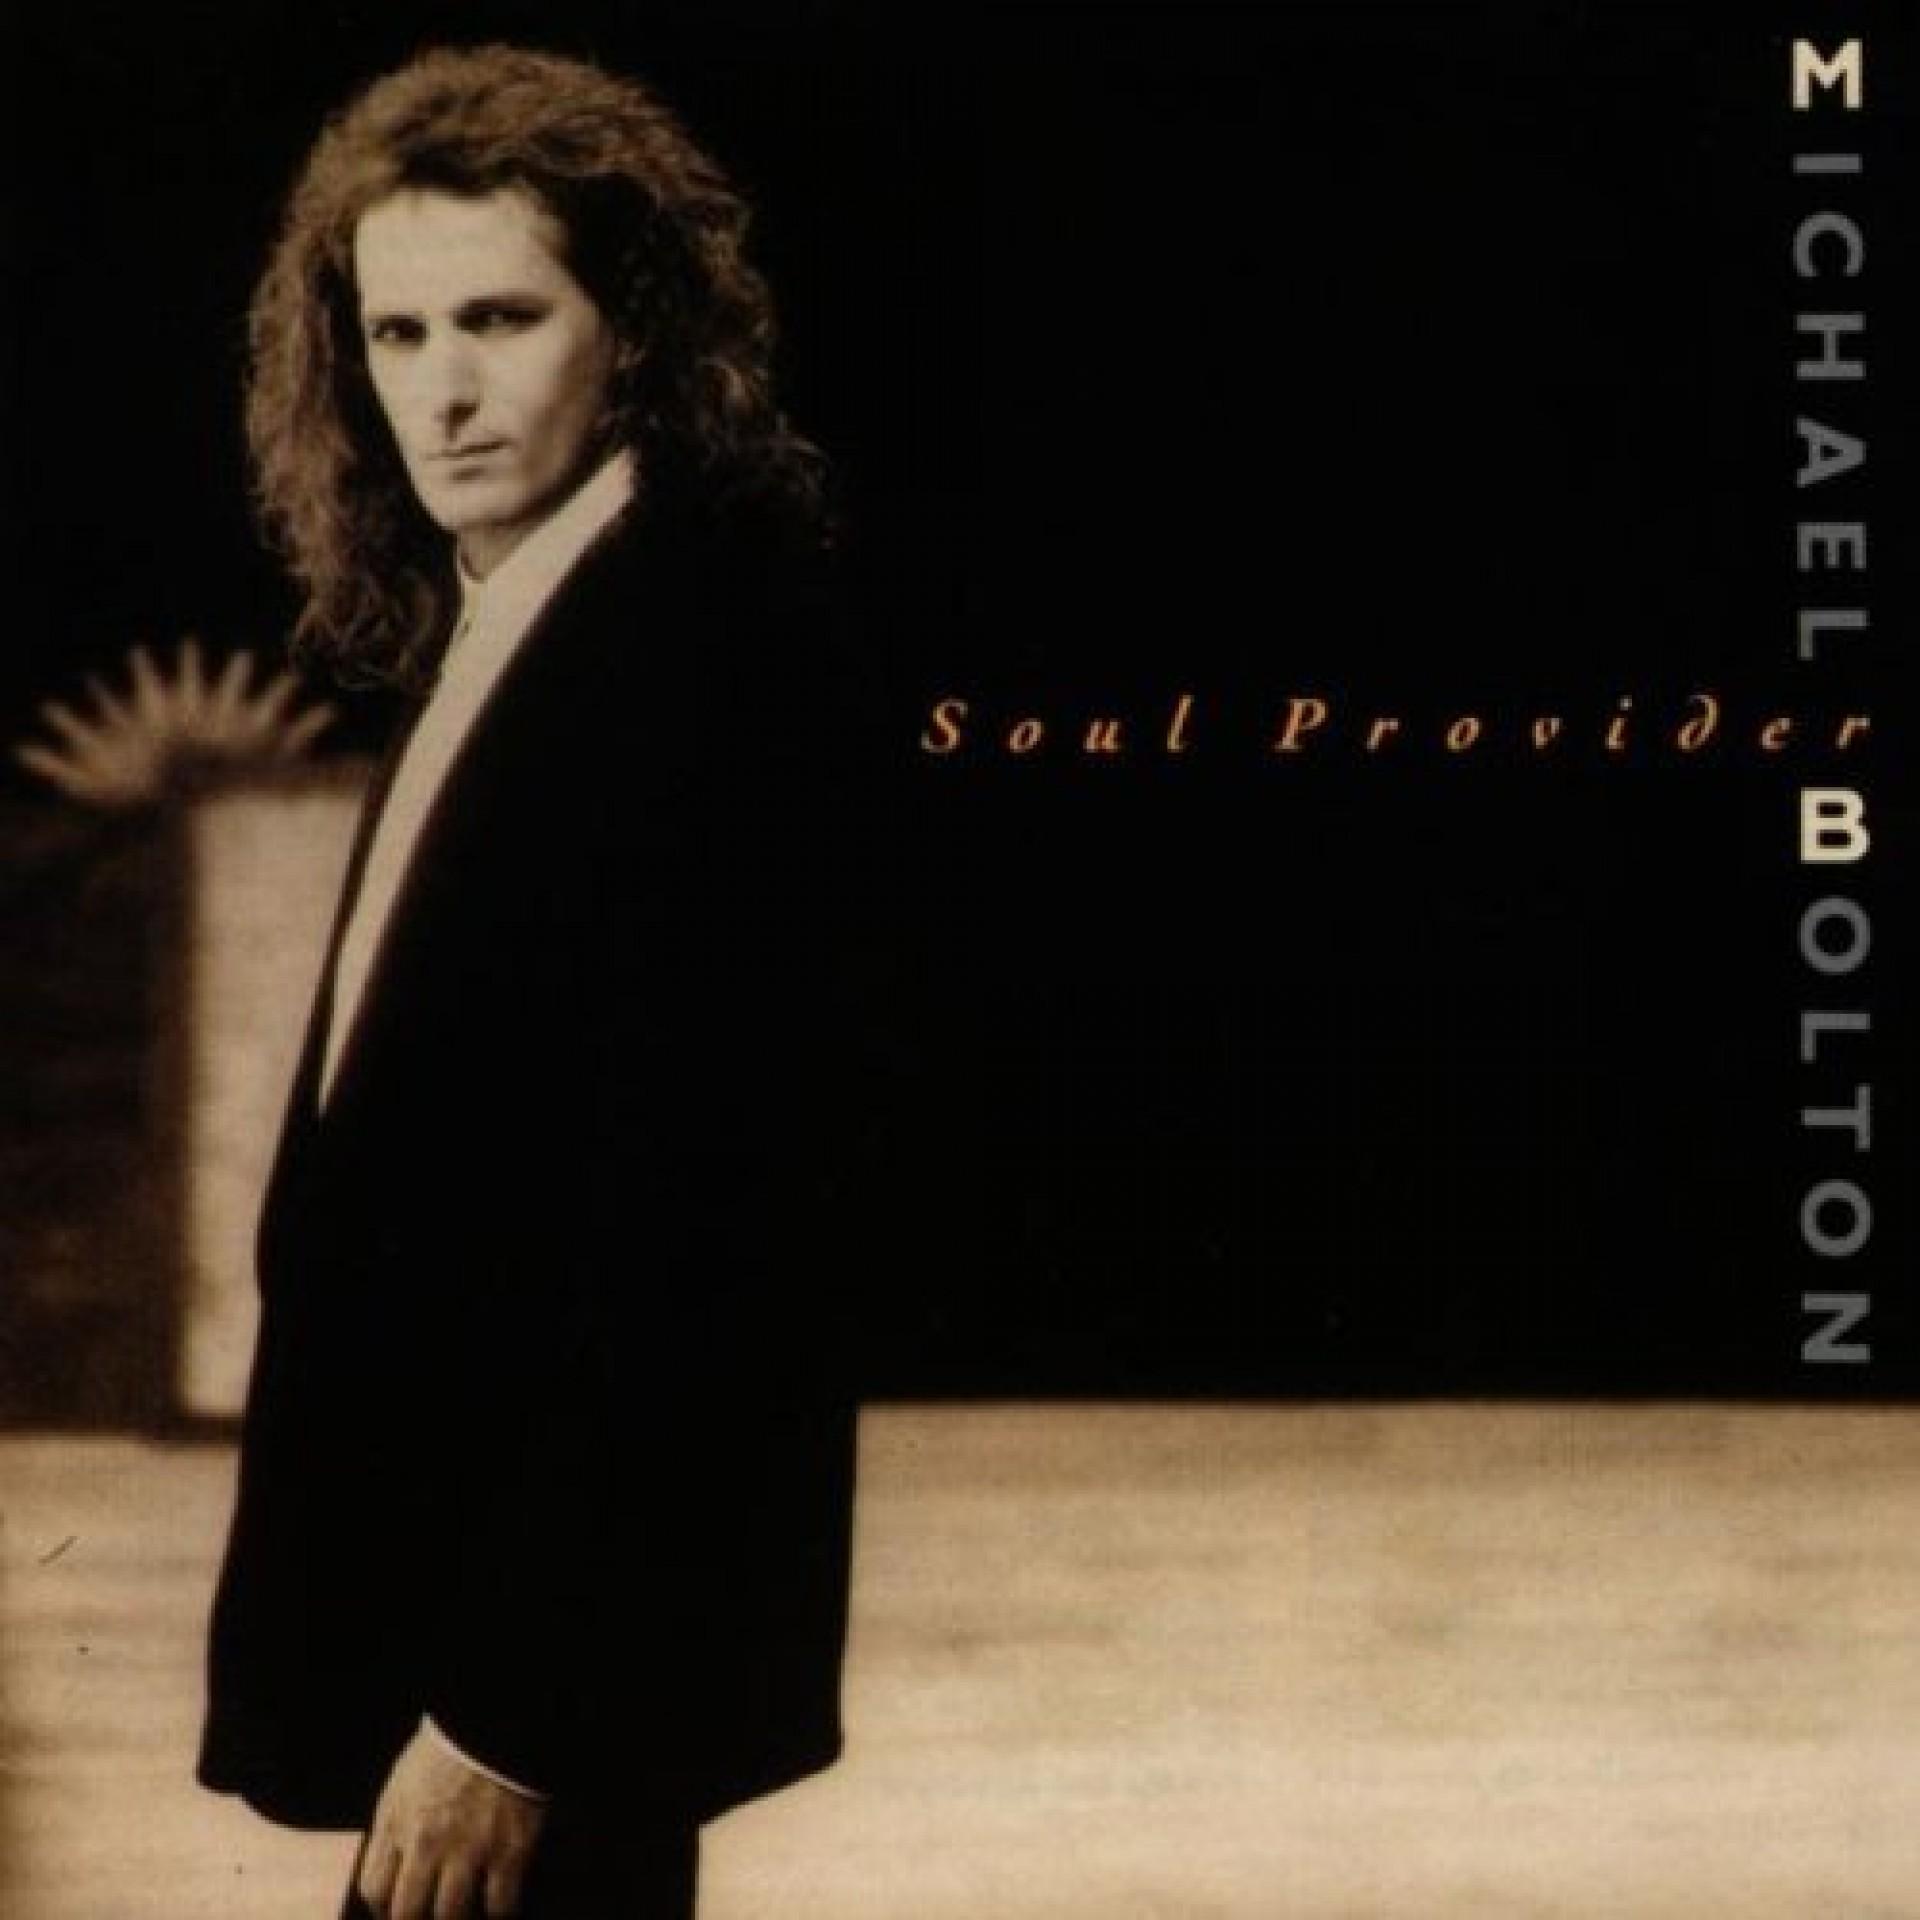 Michael Bolton, Soul Provider, Lp, Vinyl